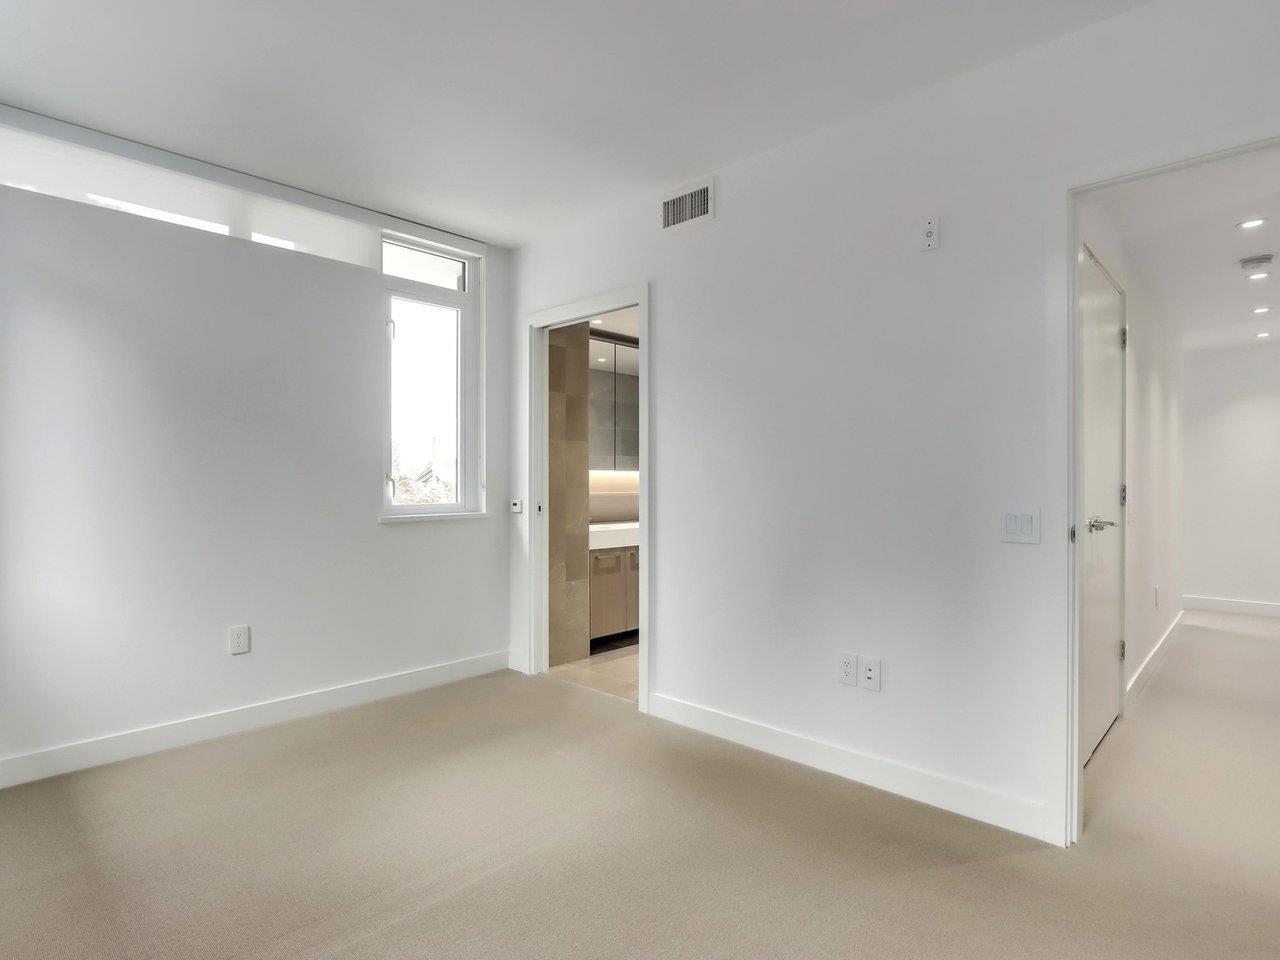 202 1055 RIDGEWOOD DRIVE - Edgemont Townhouse for sale, 3 Bedrooms (R2611487) - #16